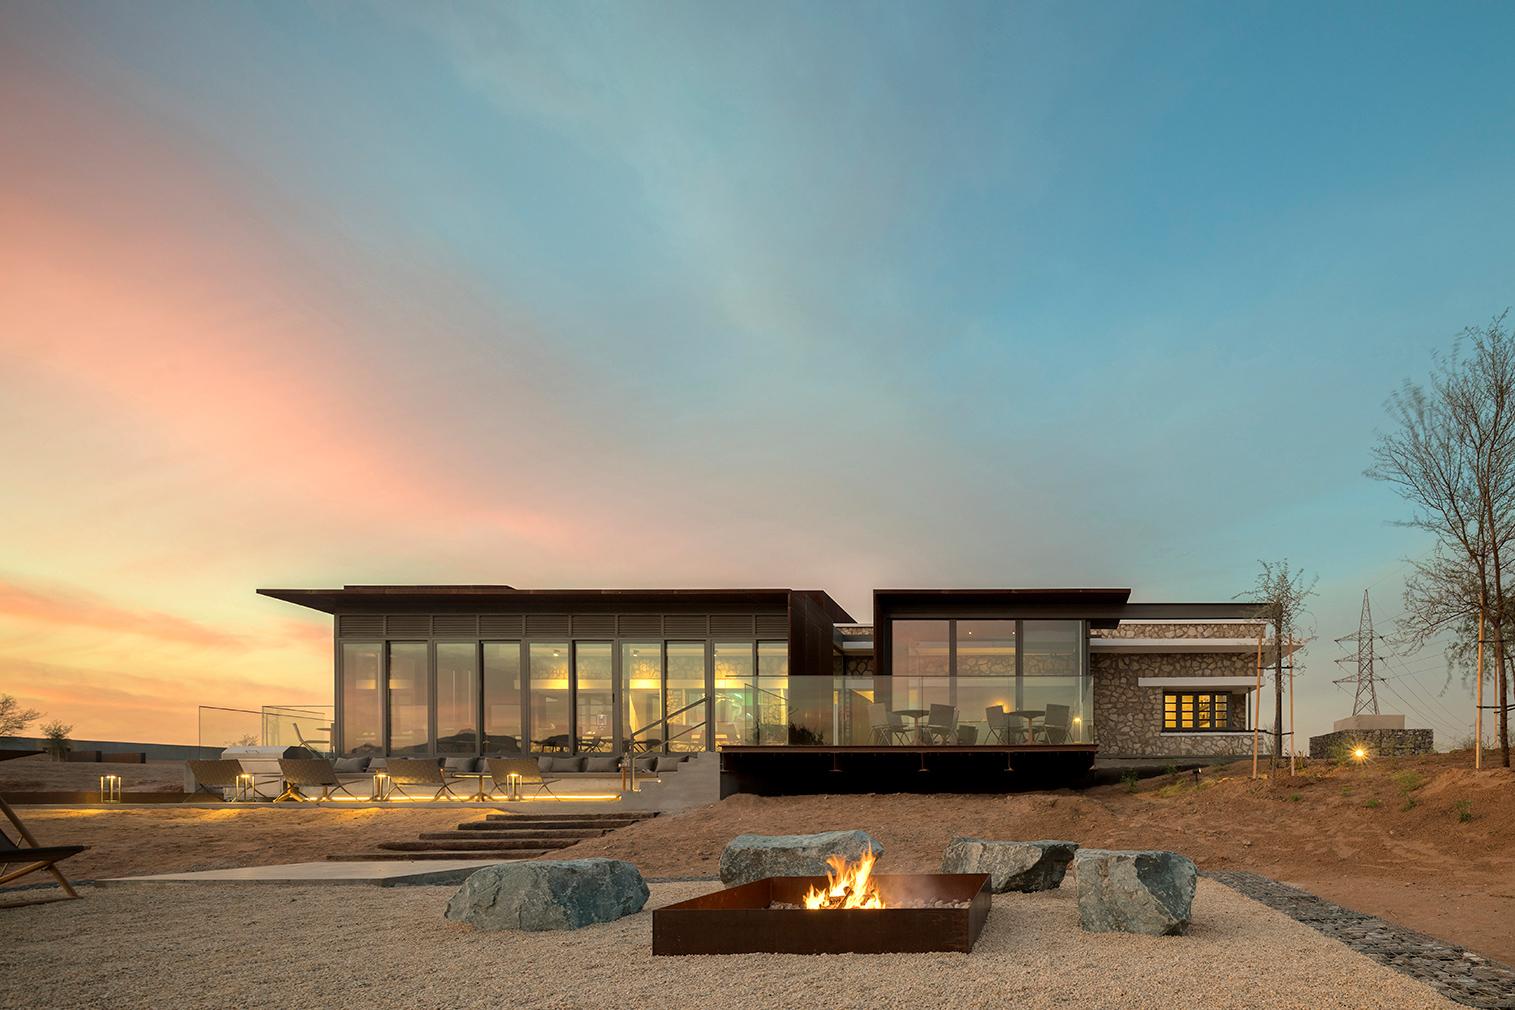 Al Faya Lodge and Spa in the United Arab Emirates